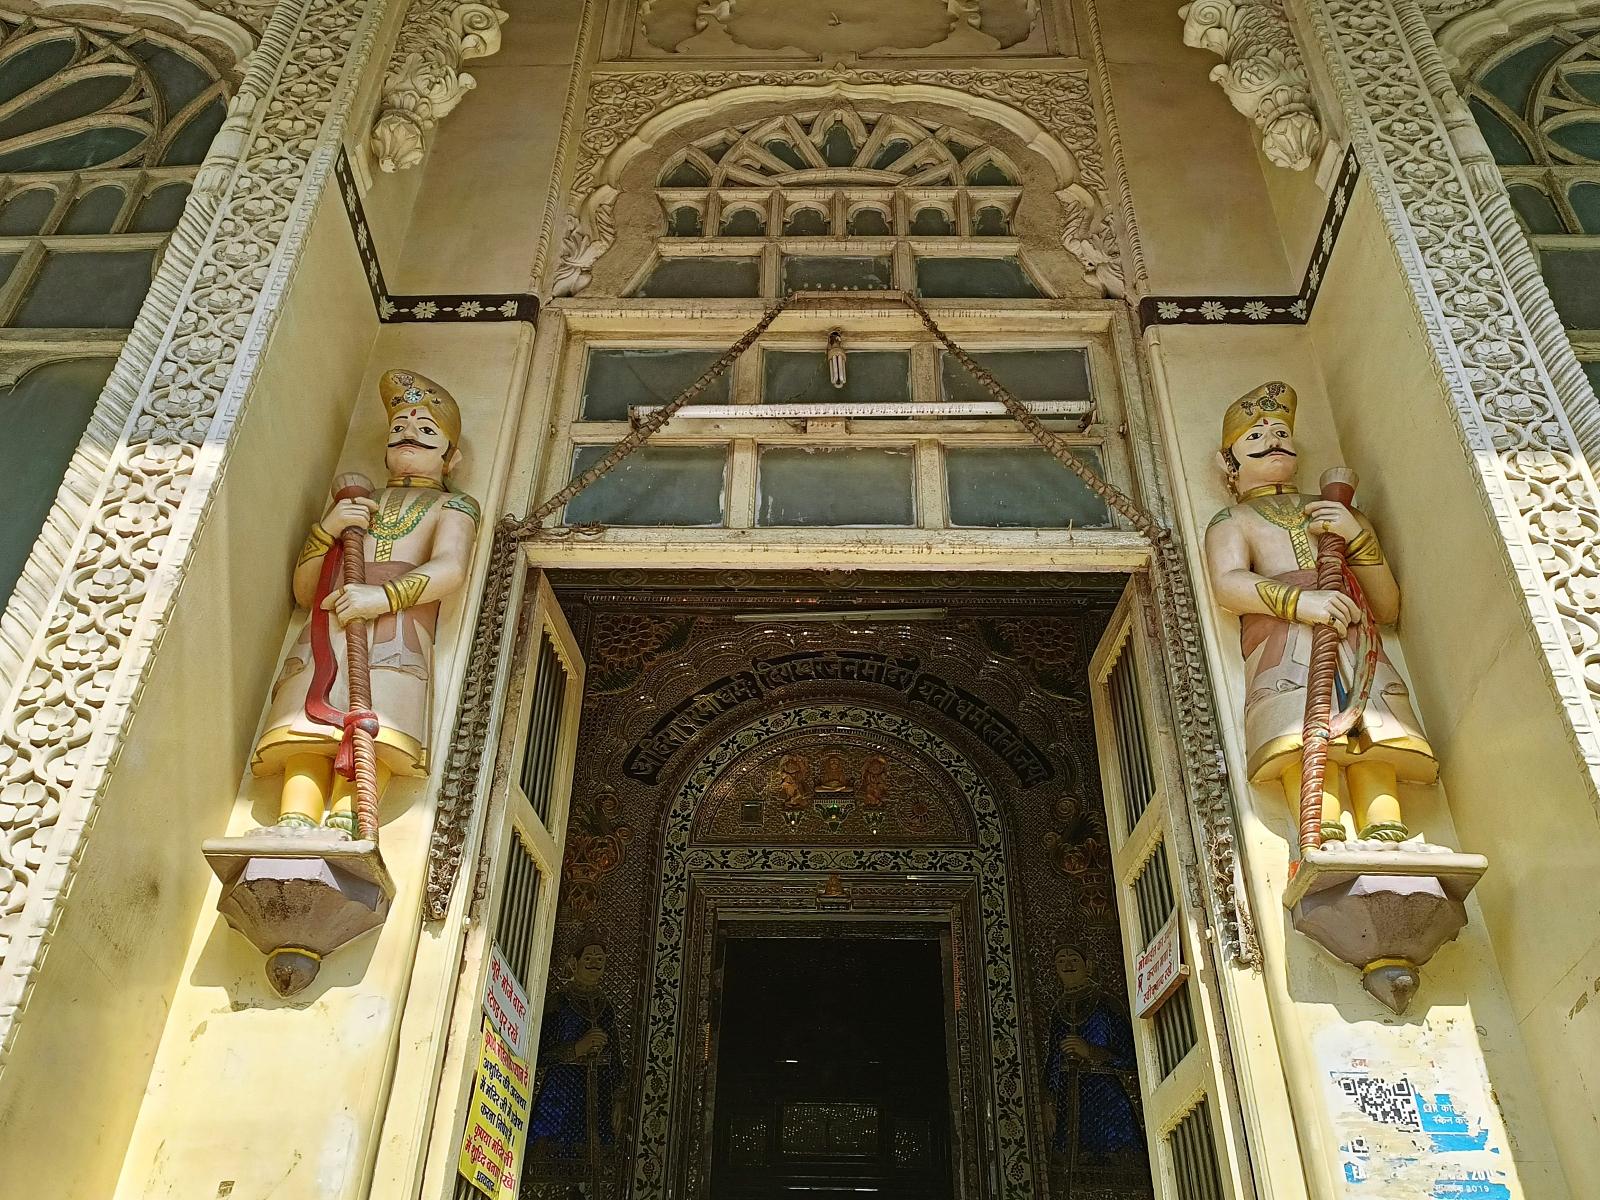 Kanch Mandir Entrance